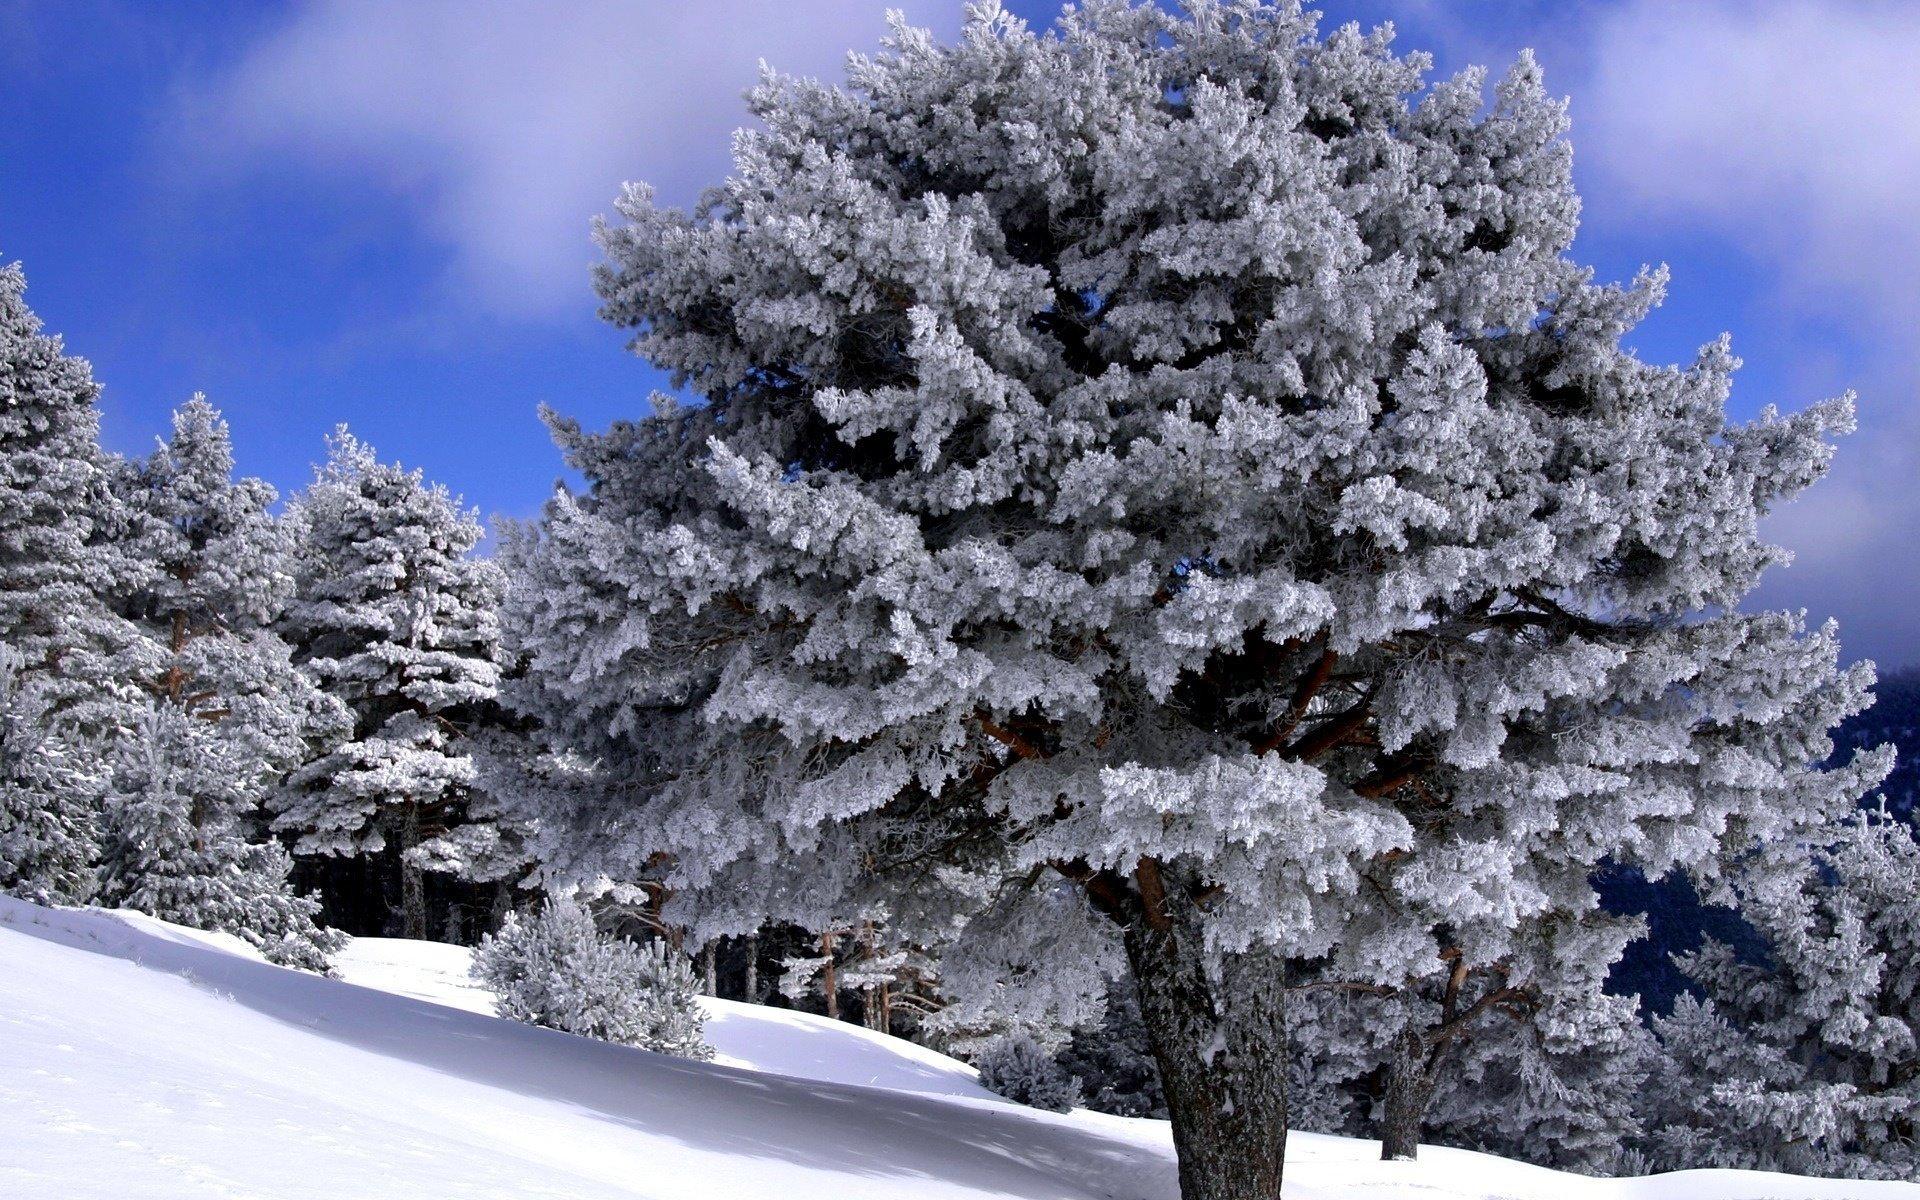 картинка лес зима деревья скажу